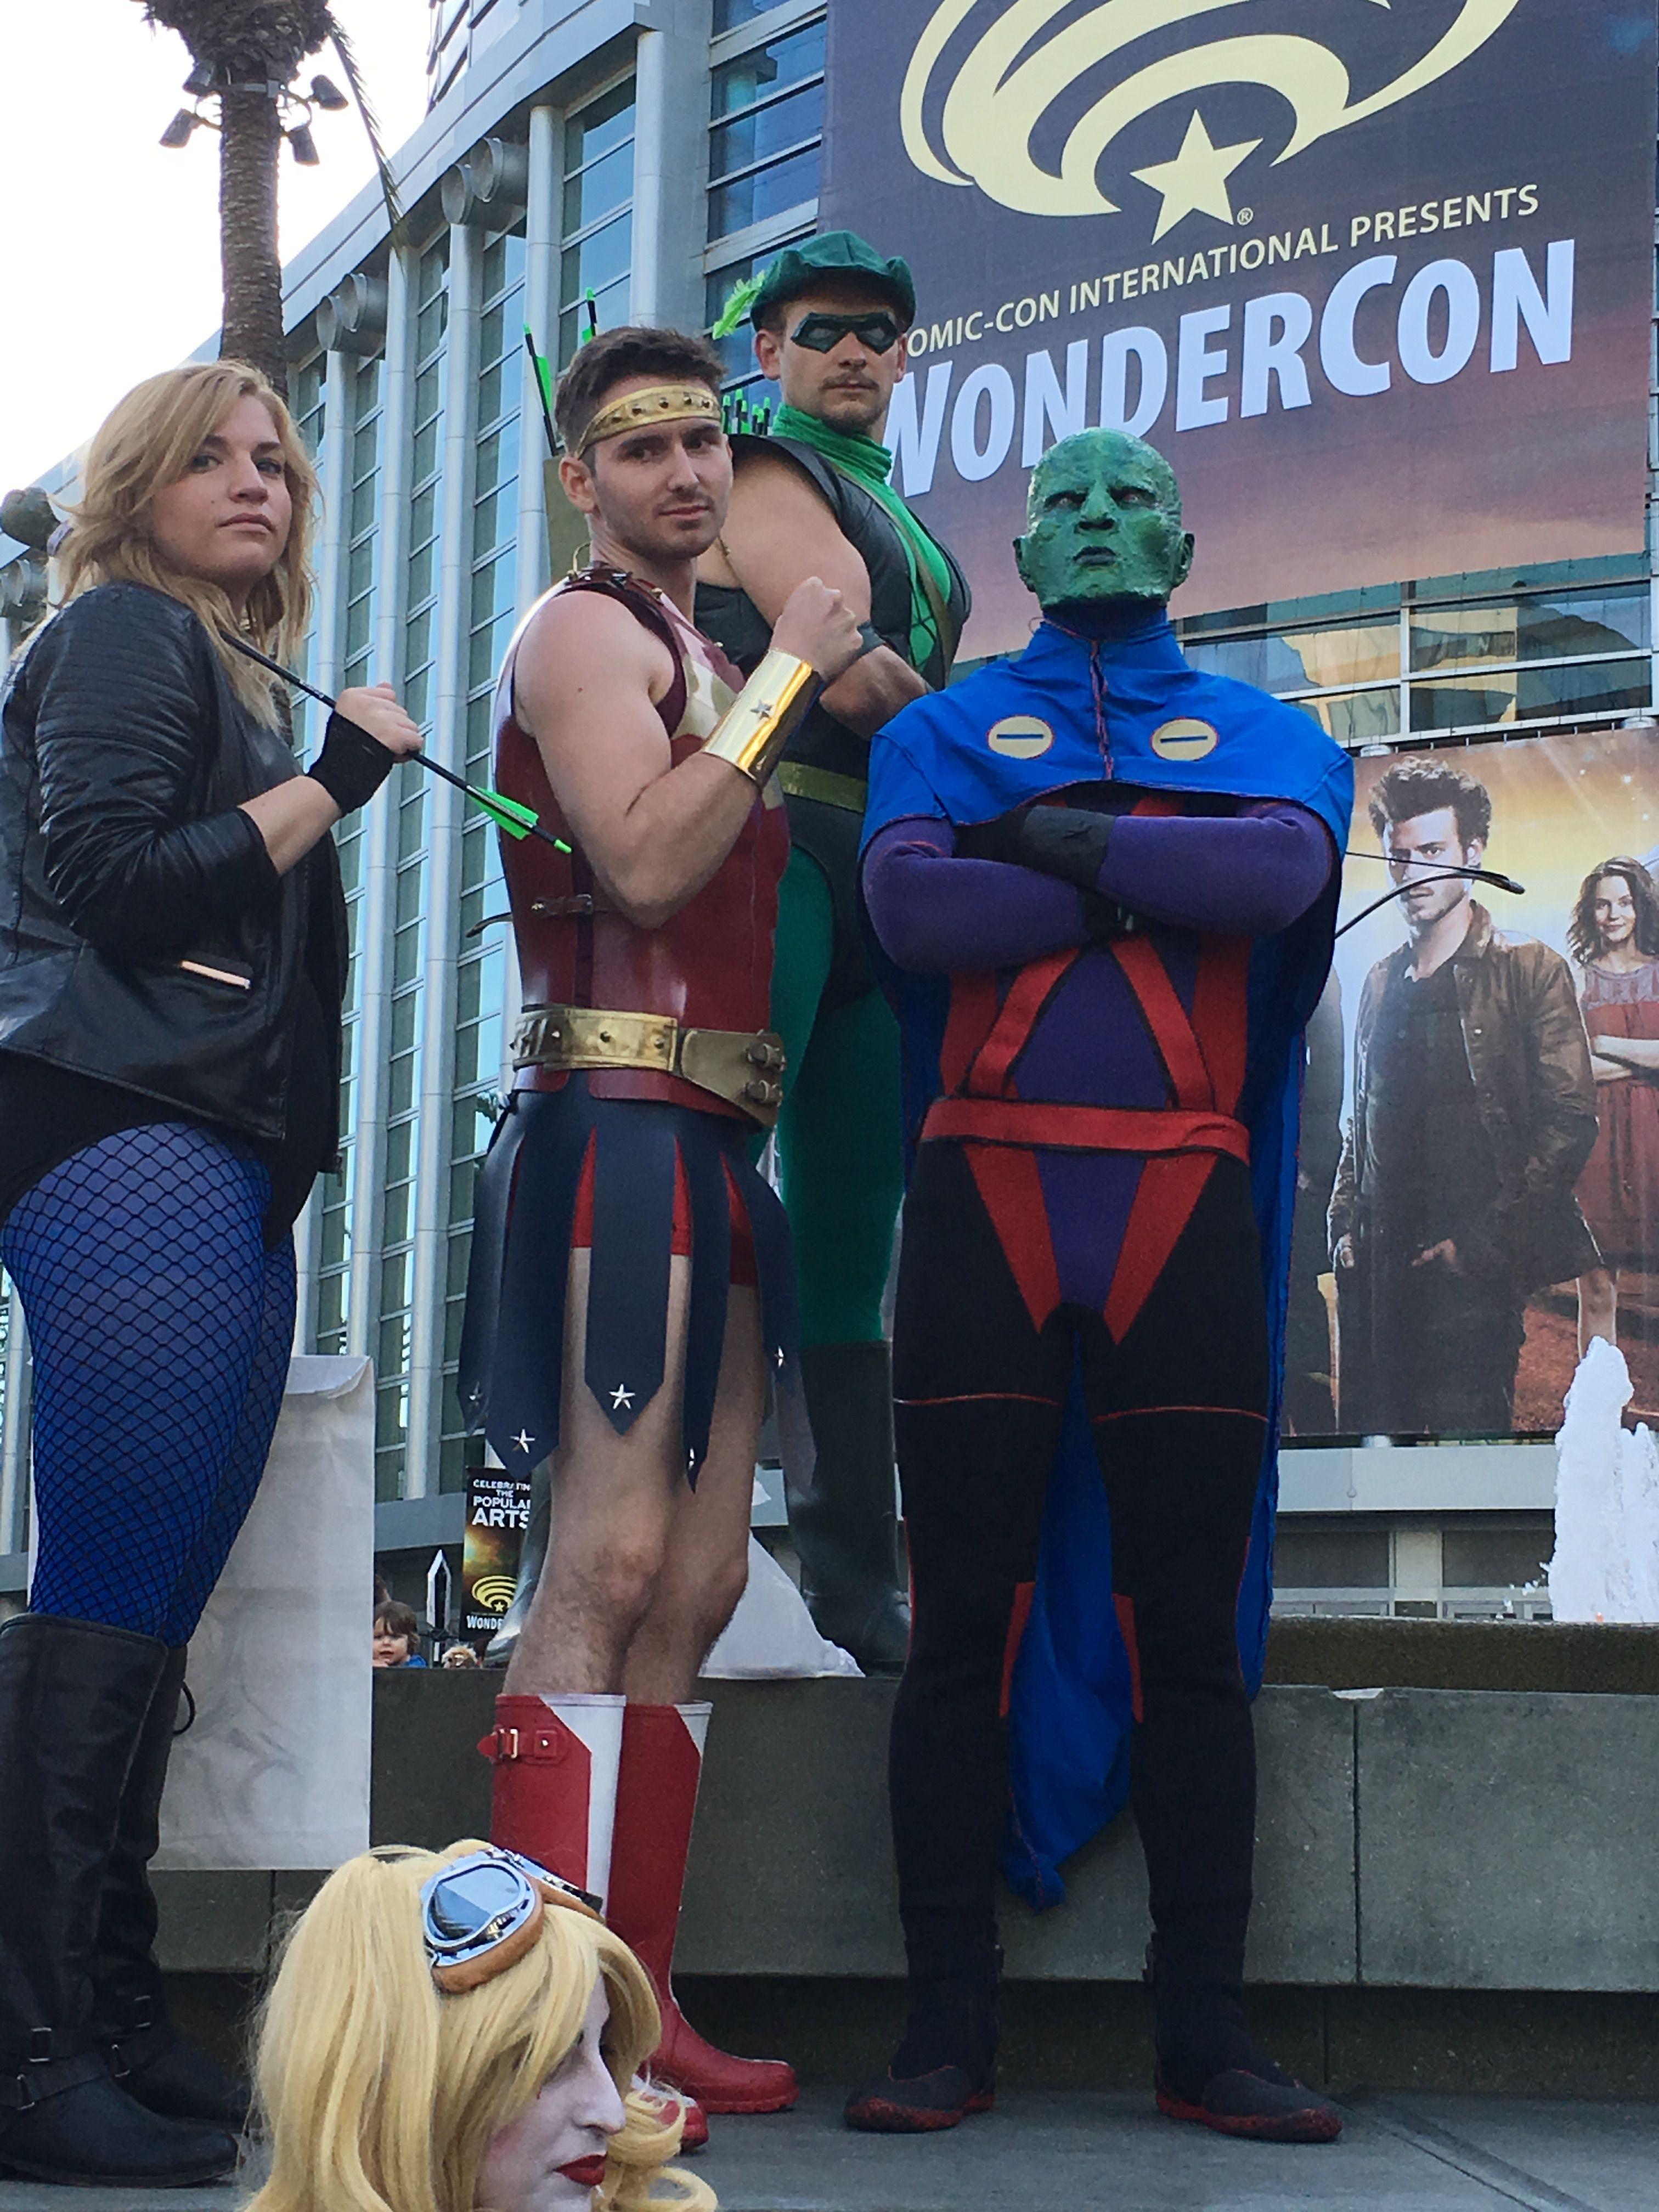 Black Canary, Captain Wonder, Green Lantern and Martian Manhunter cosplay at WonderCon 2017 #wondercon2017